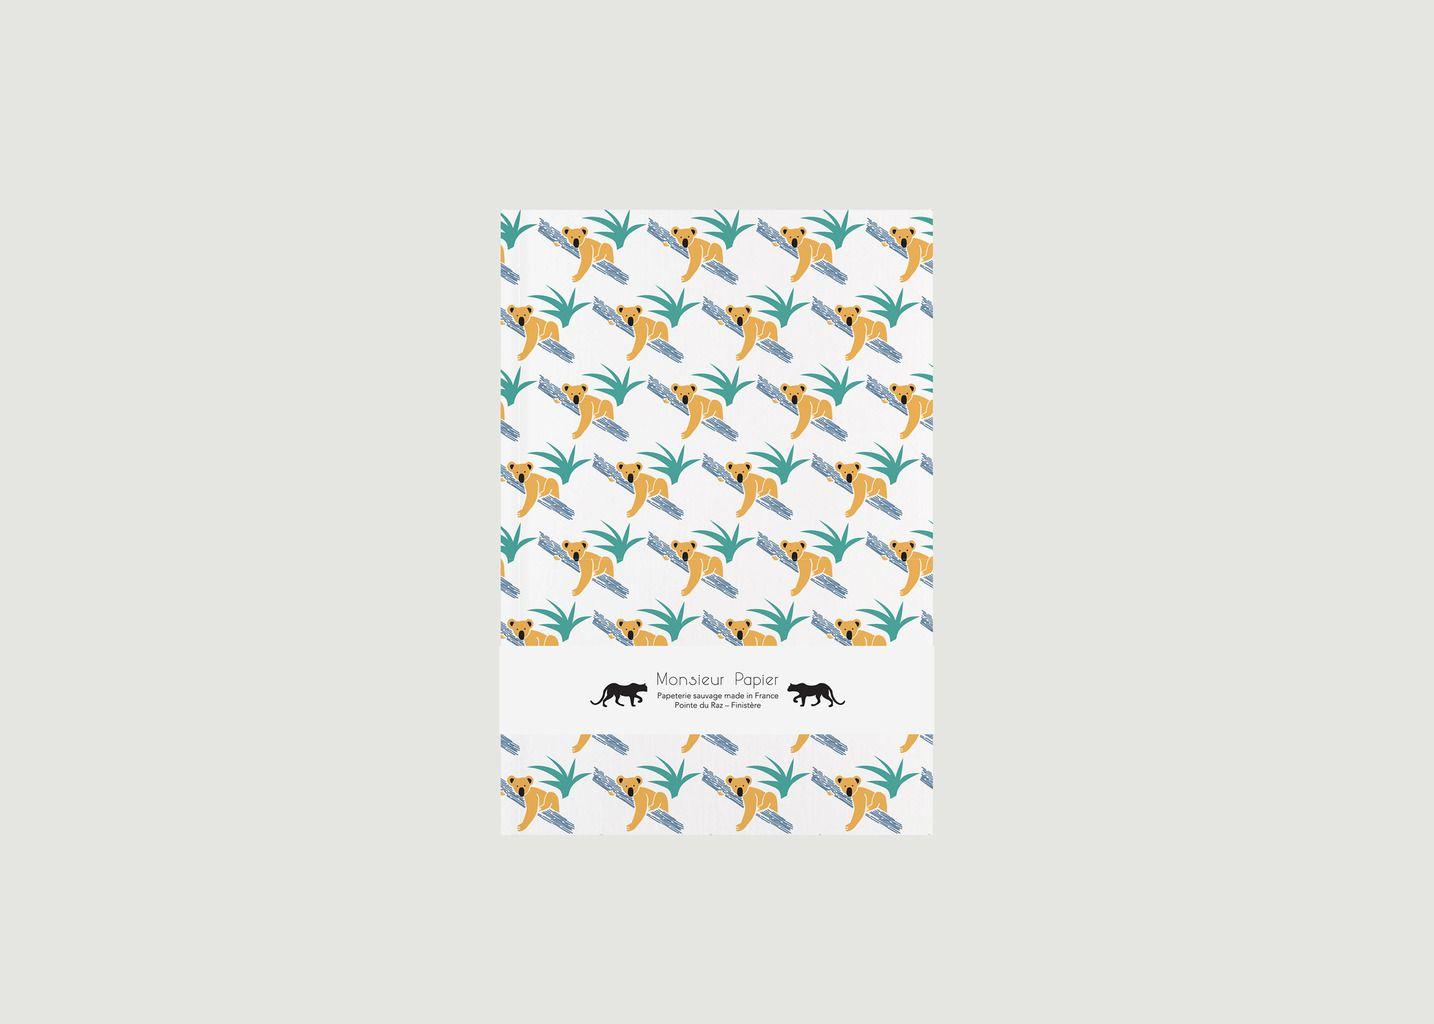 Cahier Koala - Monsieur Papier